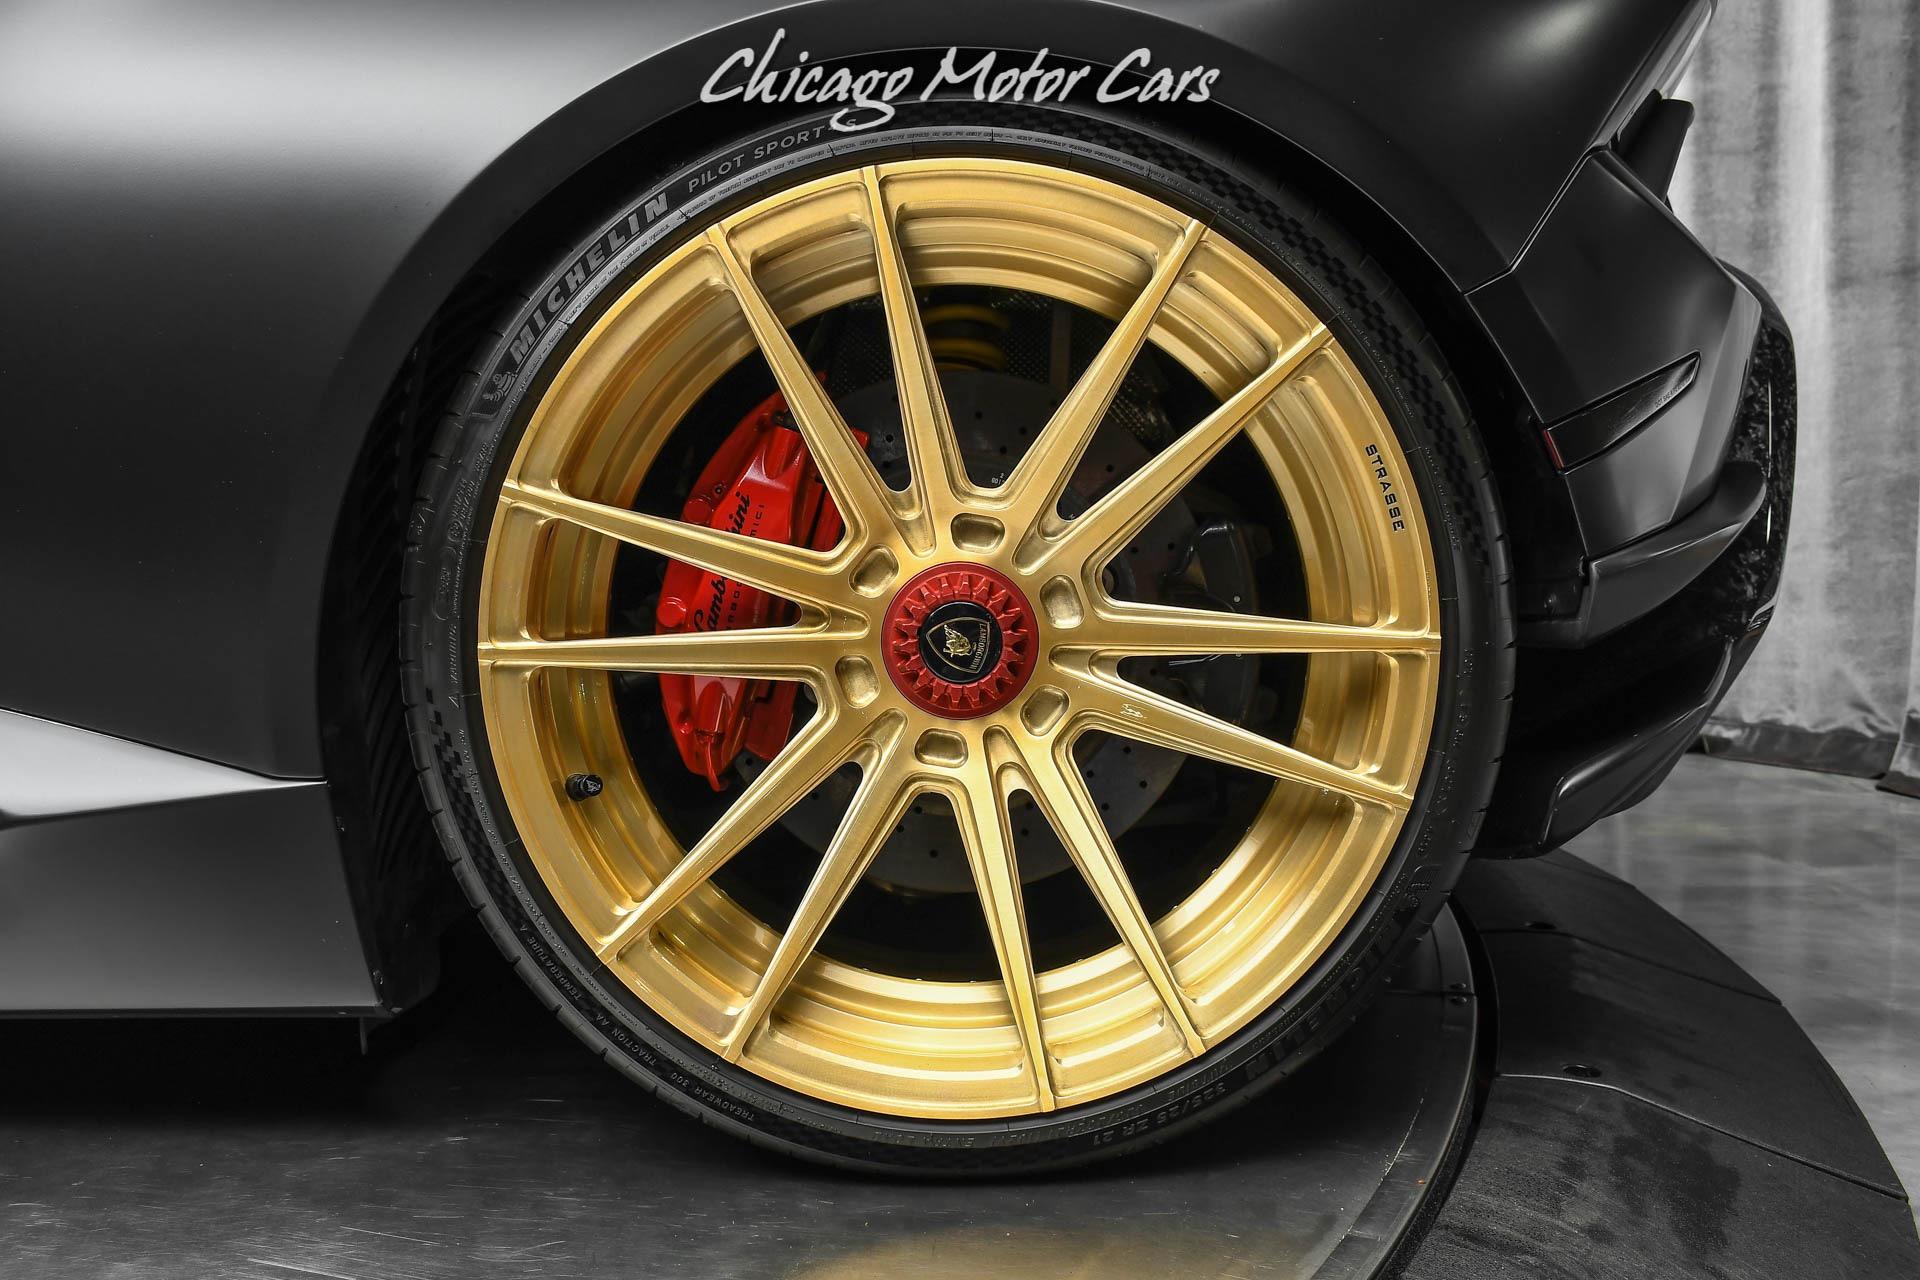 Used-2018-Lamborghini-Huracan-LP640-4-Performante-Coupe-Twin-Turbo-Motec-1000-WHP